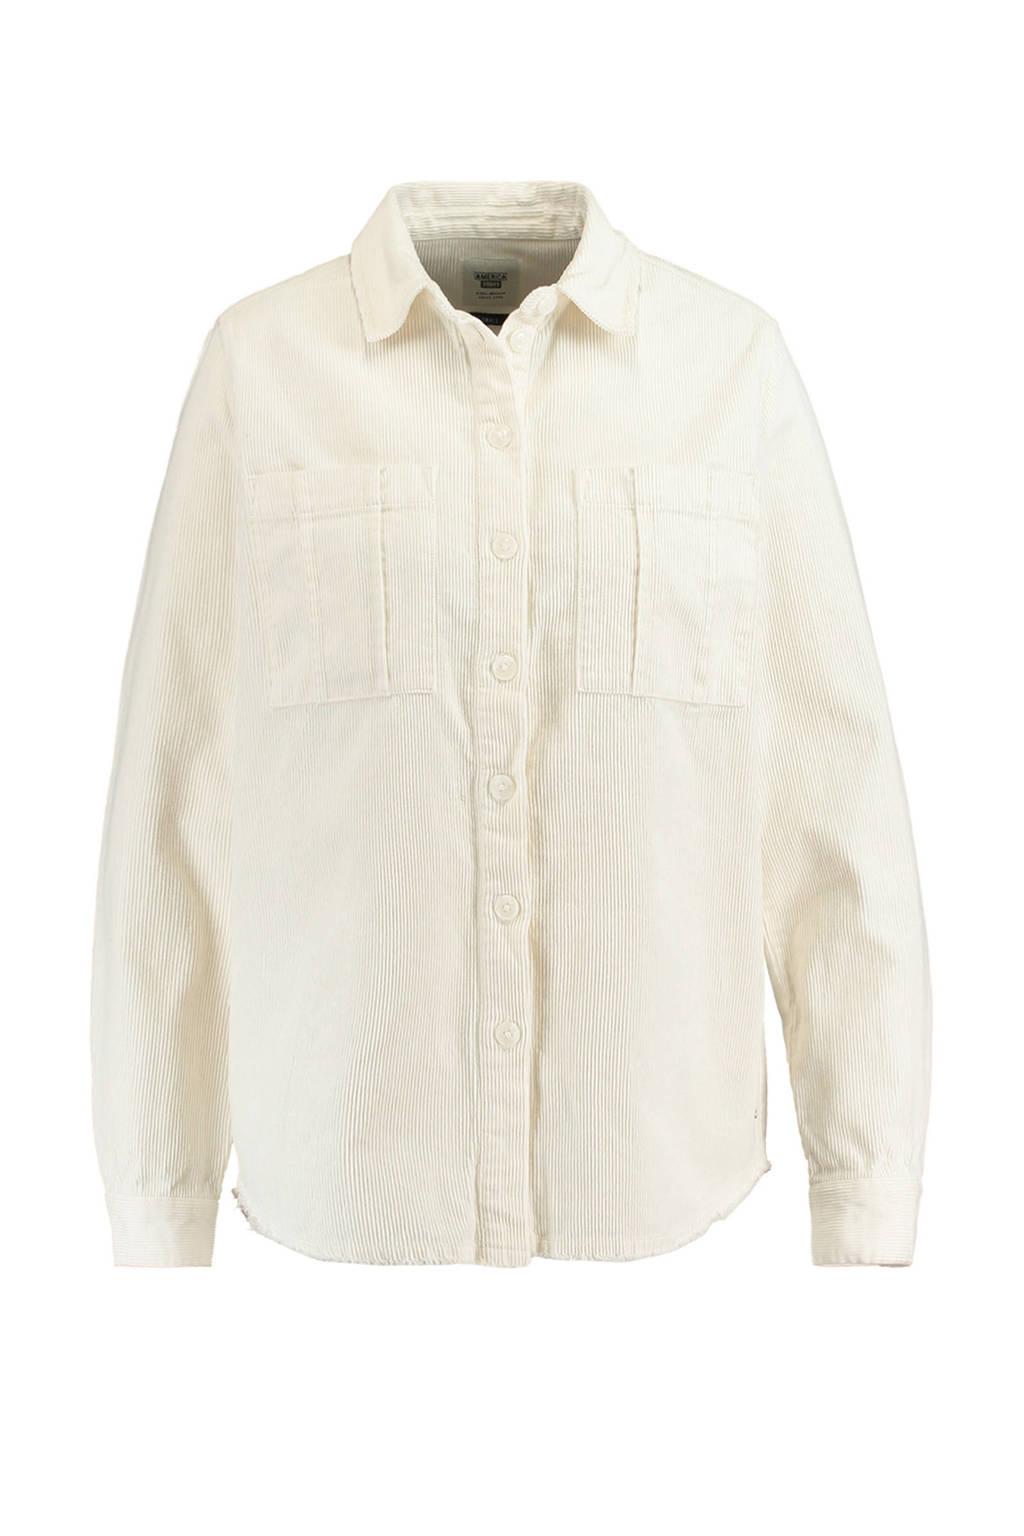 America Today corduroy blouse ecru, Ecru